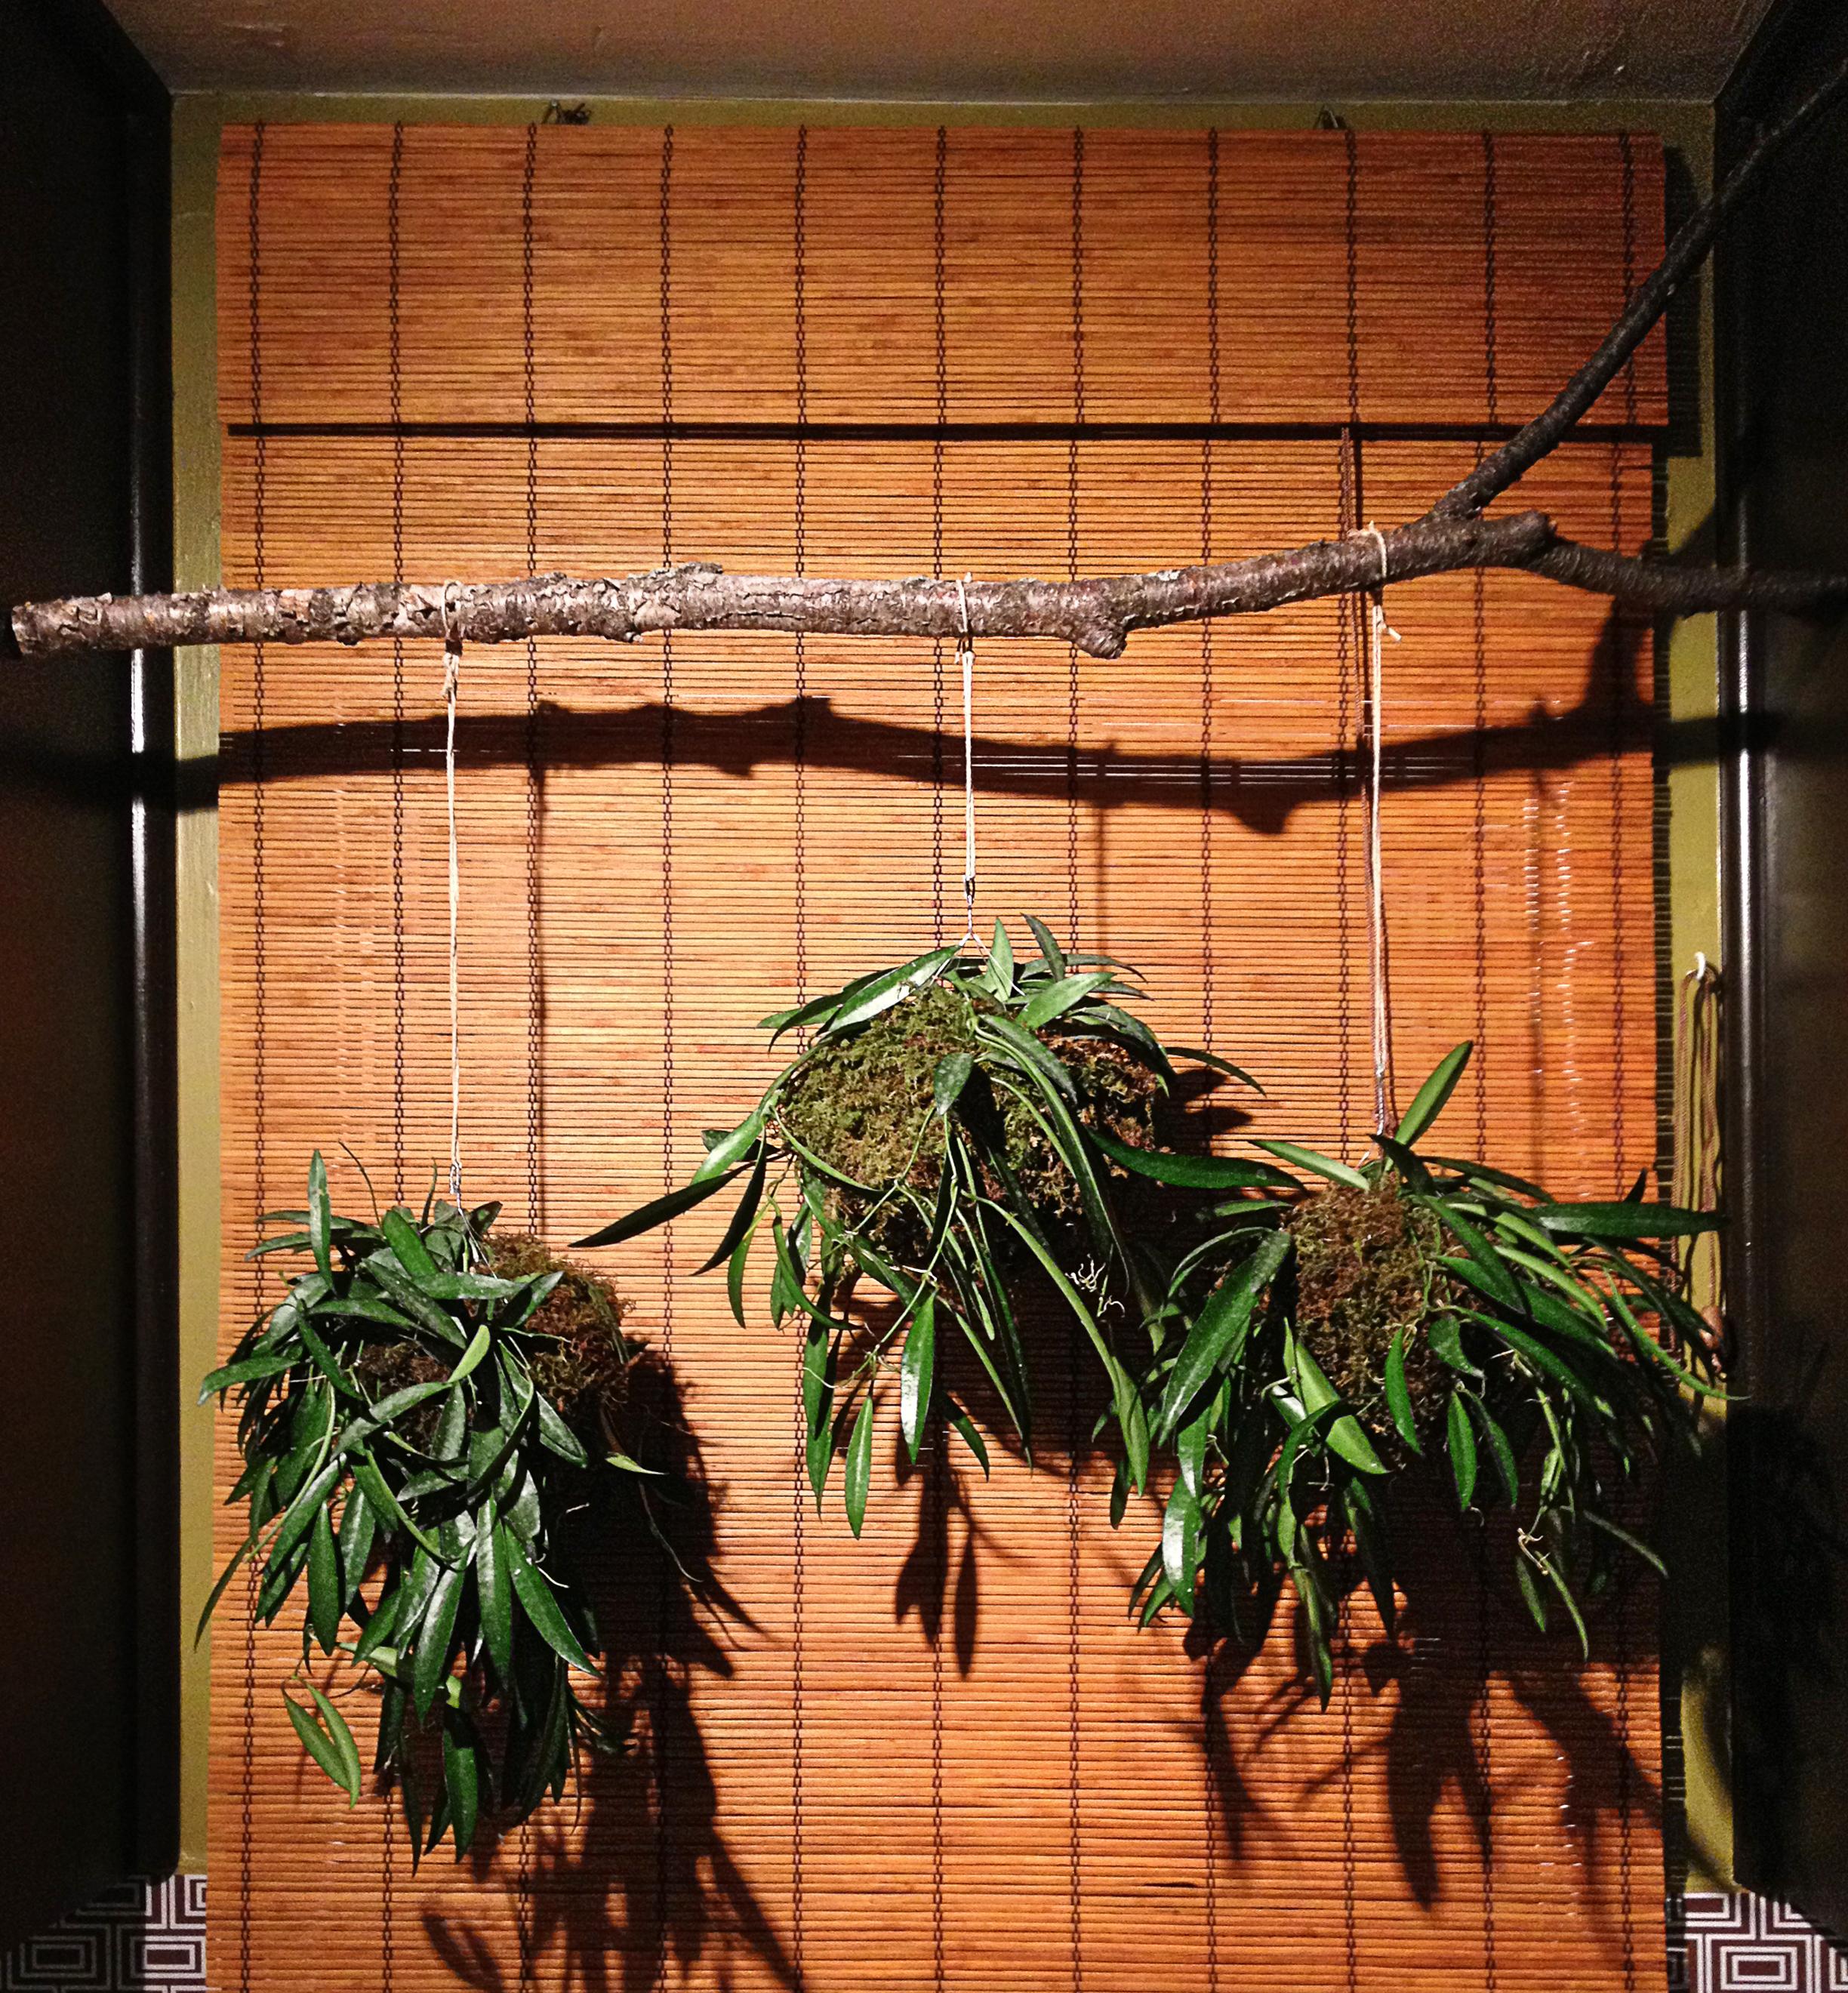 Kokedama Style Hanging Plant Balls   Ideas Realized on Plant Hanging Ideas  id=65128